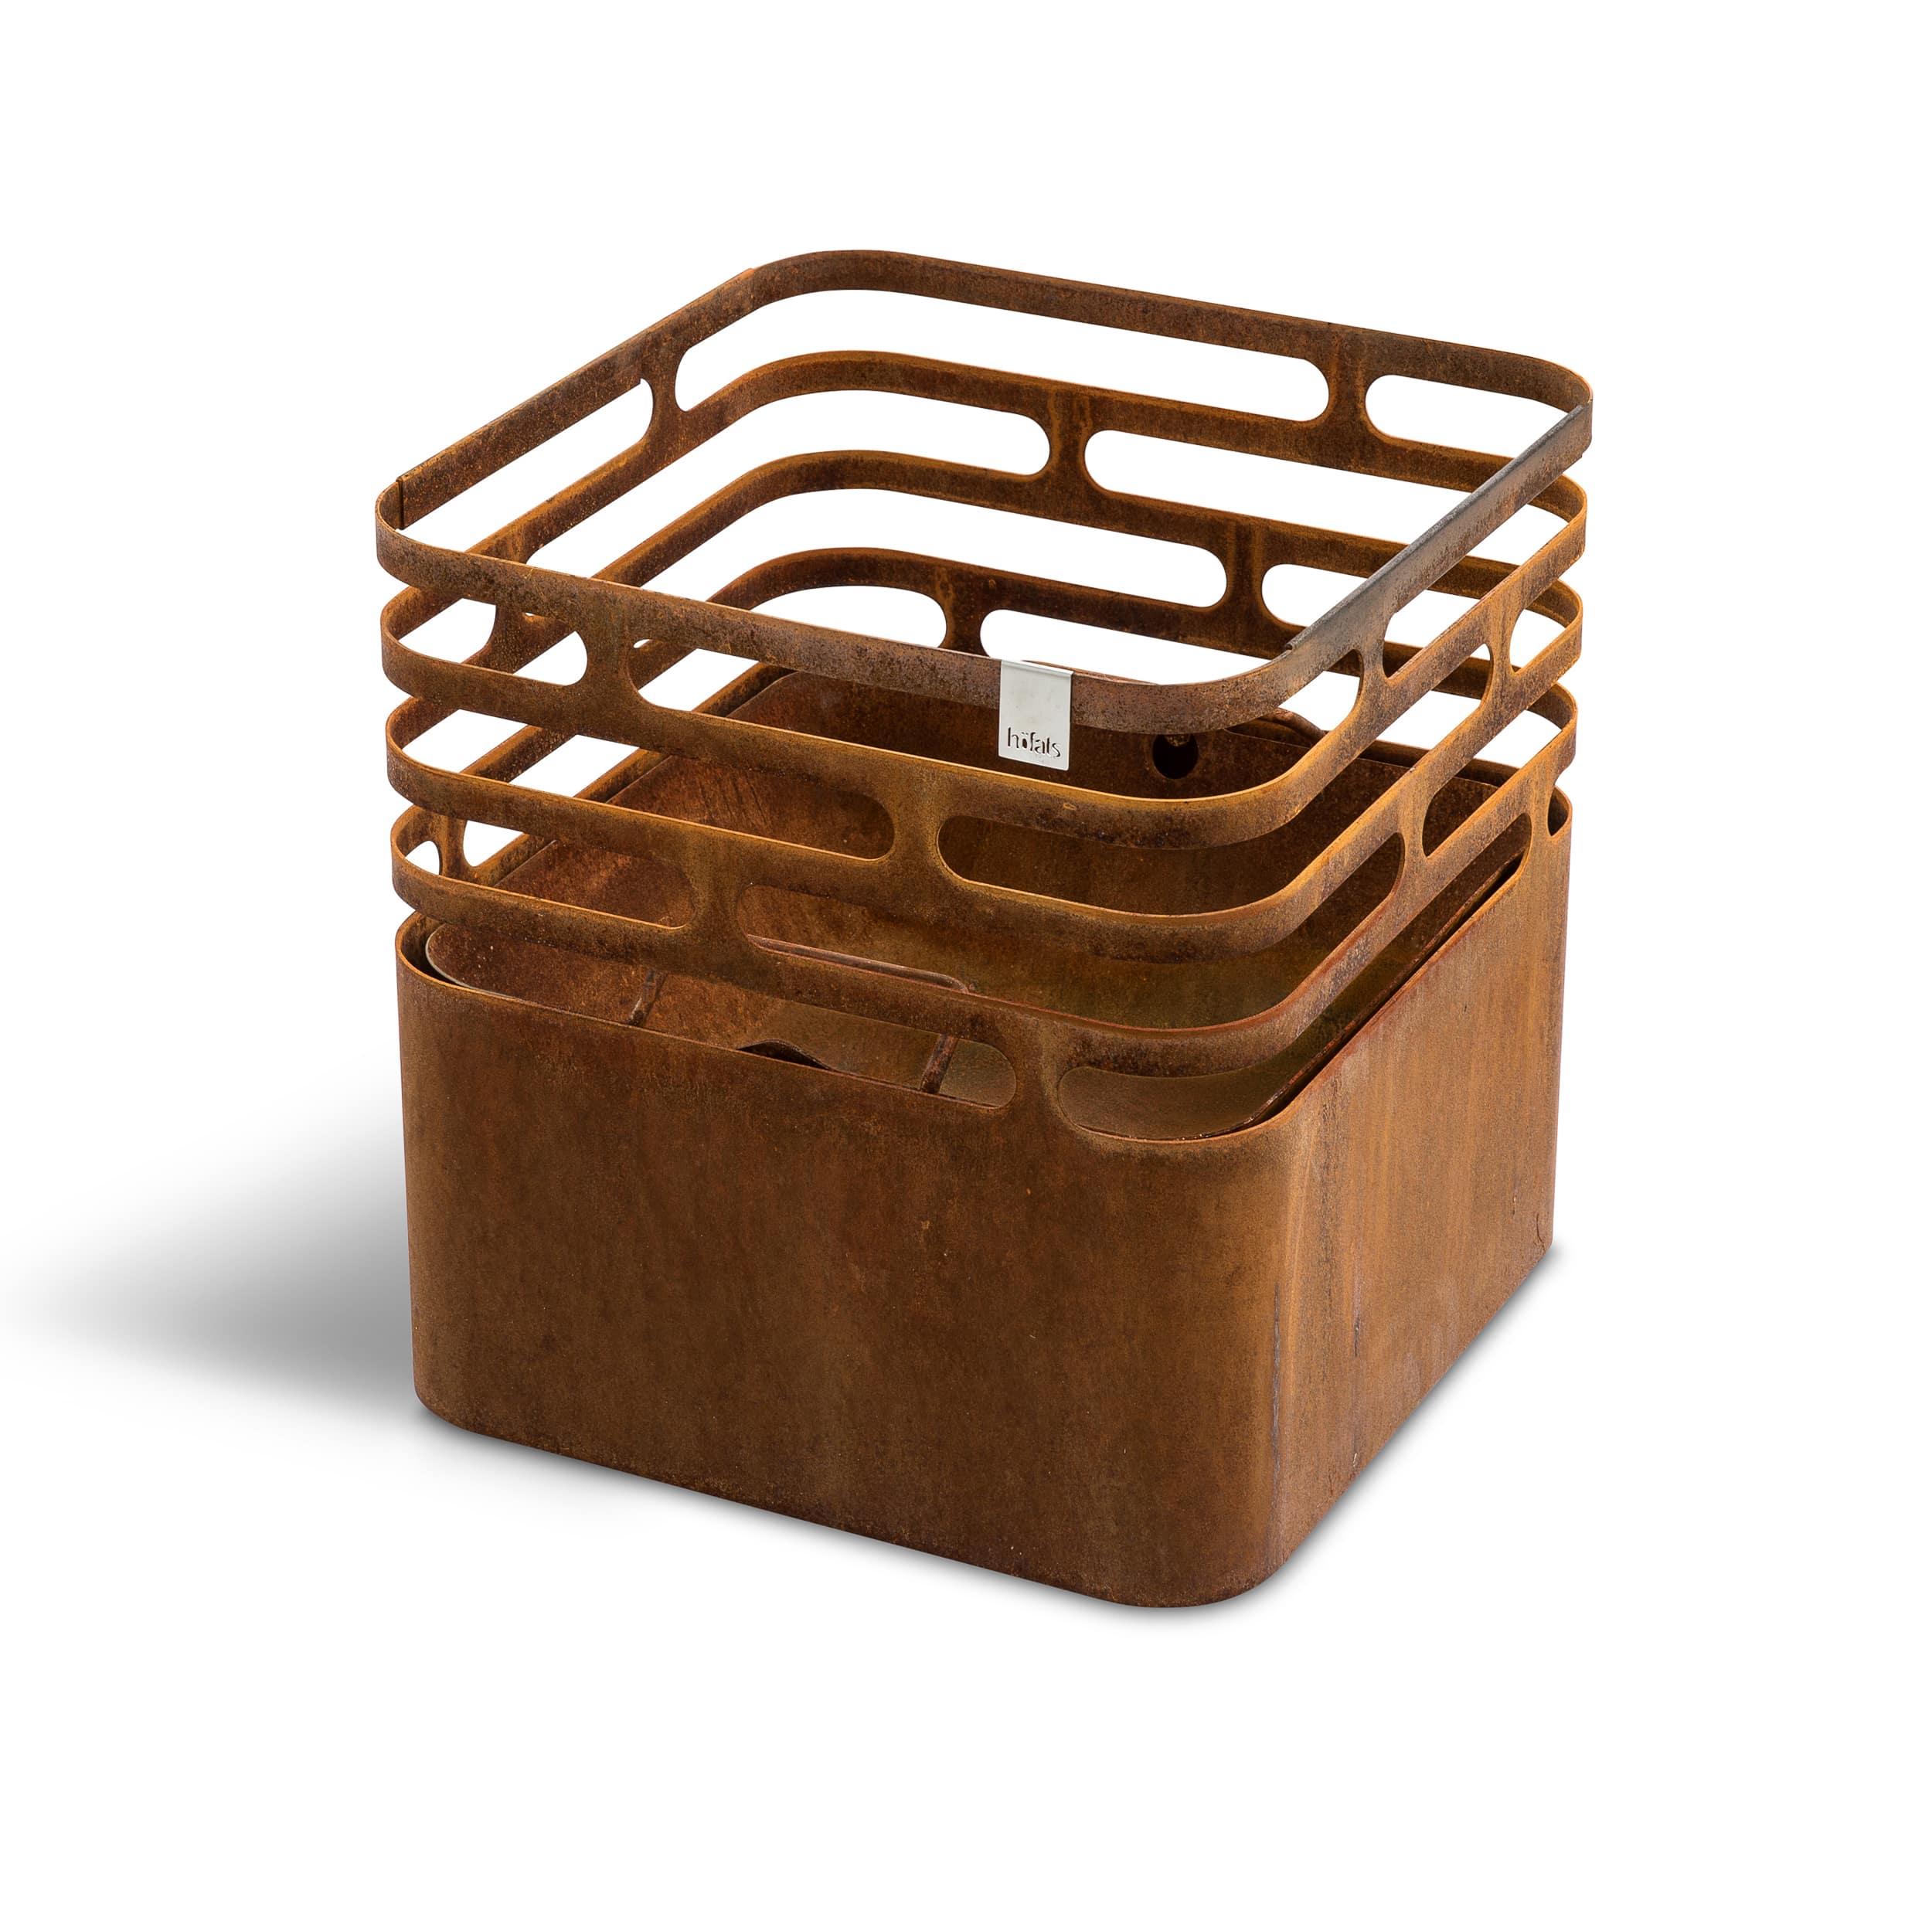 Höfats Cube vuurkorf, roestbruin